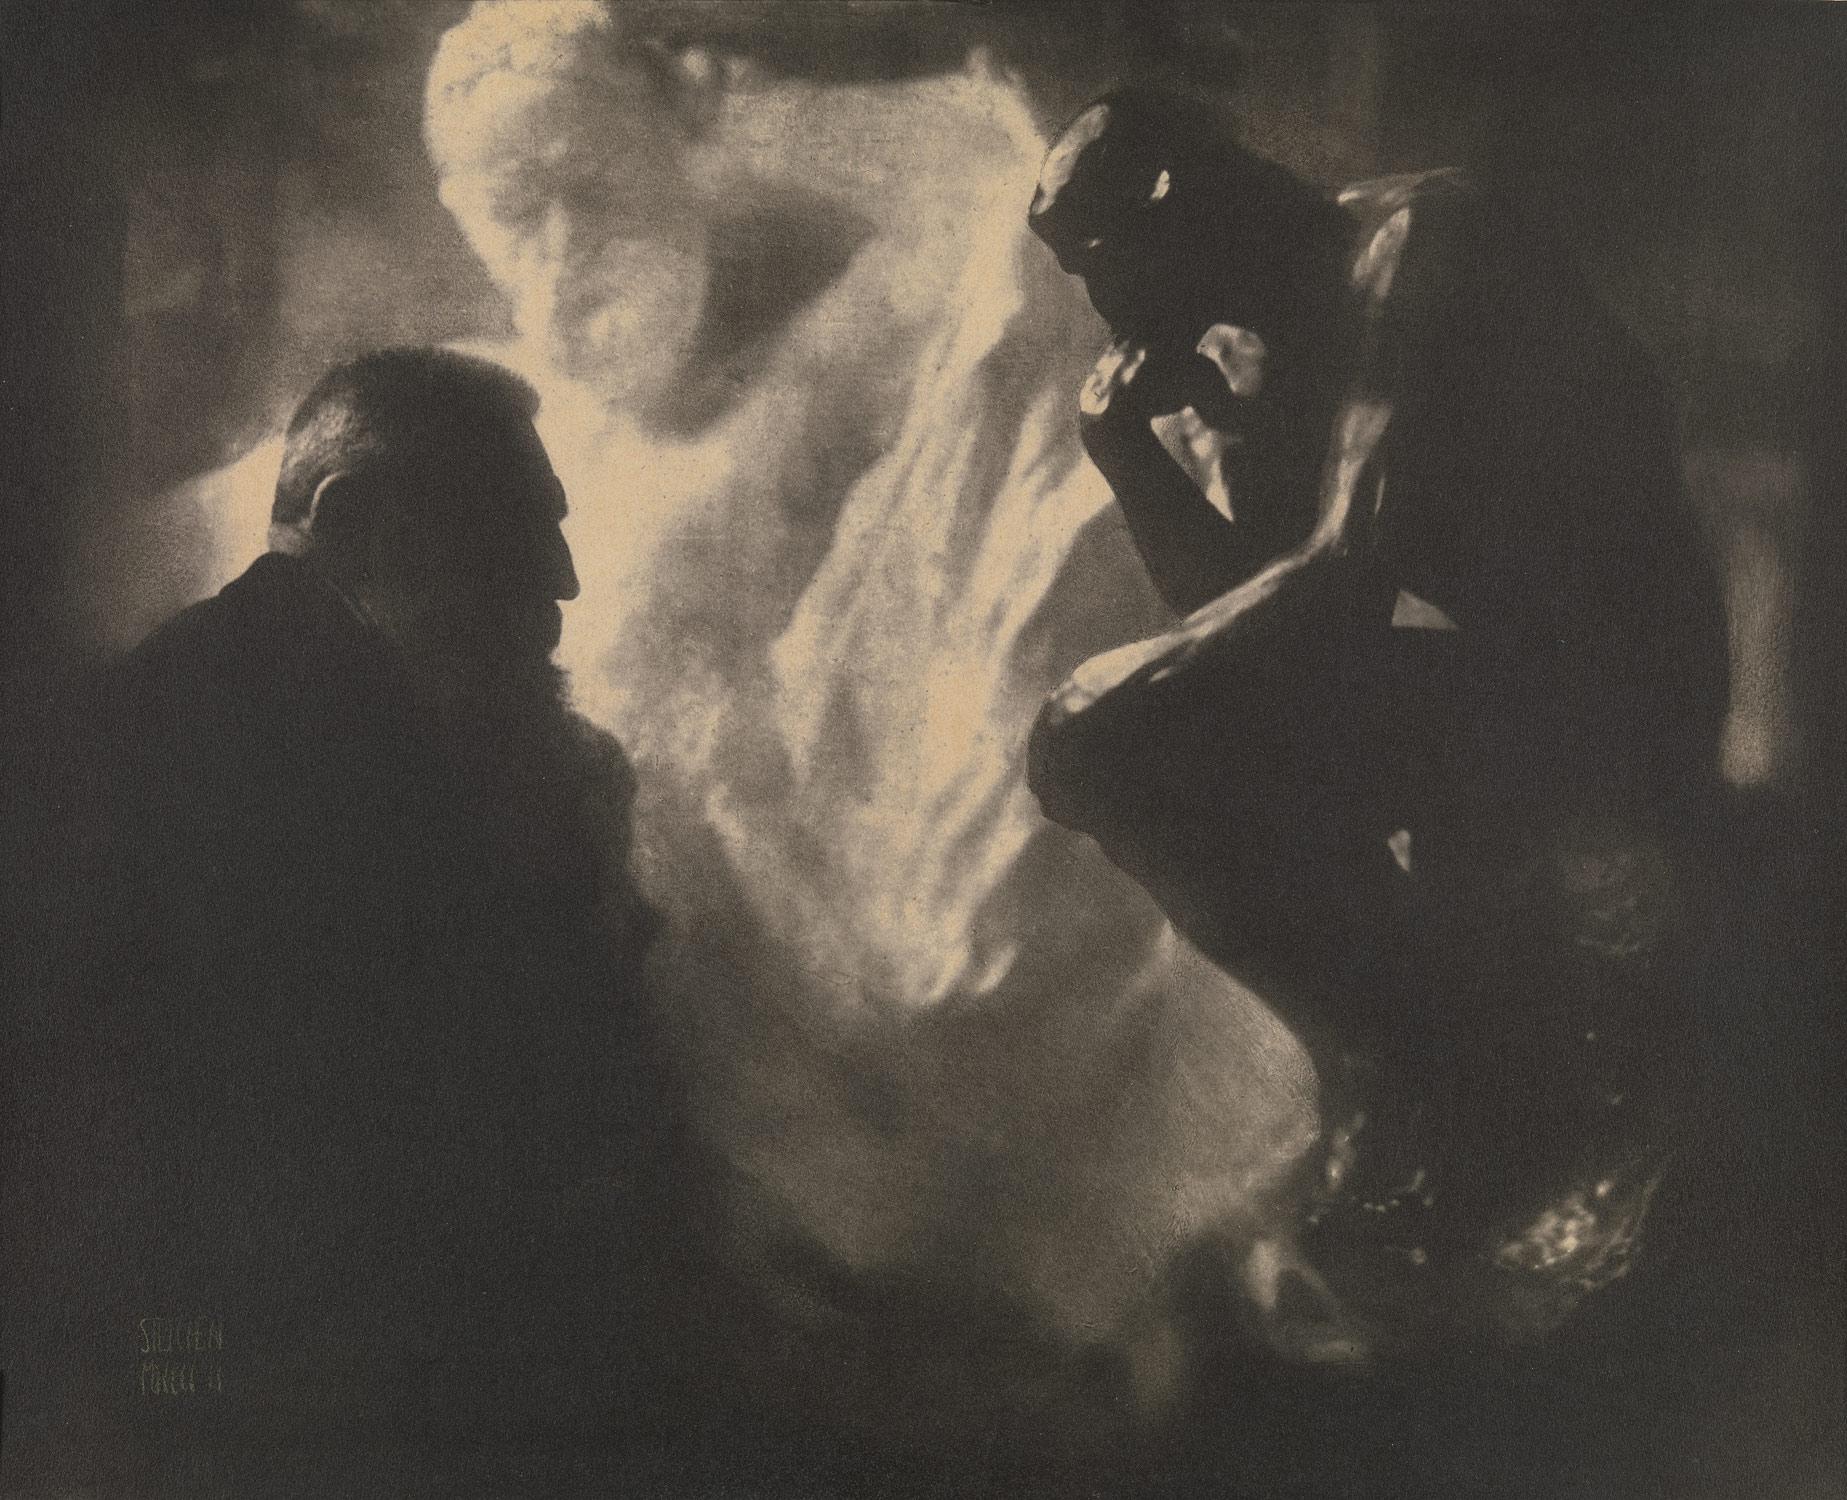 Extreem Rodin—The Thinker | Edward J. Steichen | 2005.100.289 | Work of  &UB87